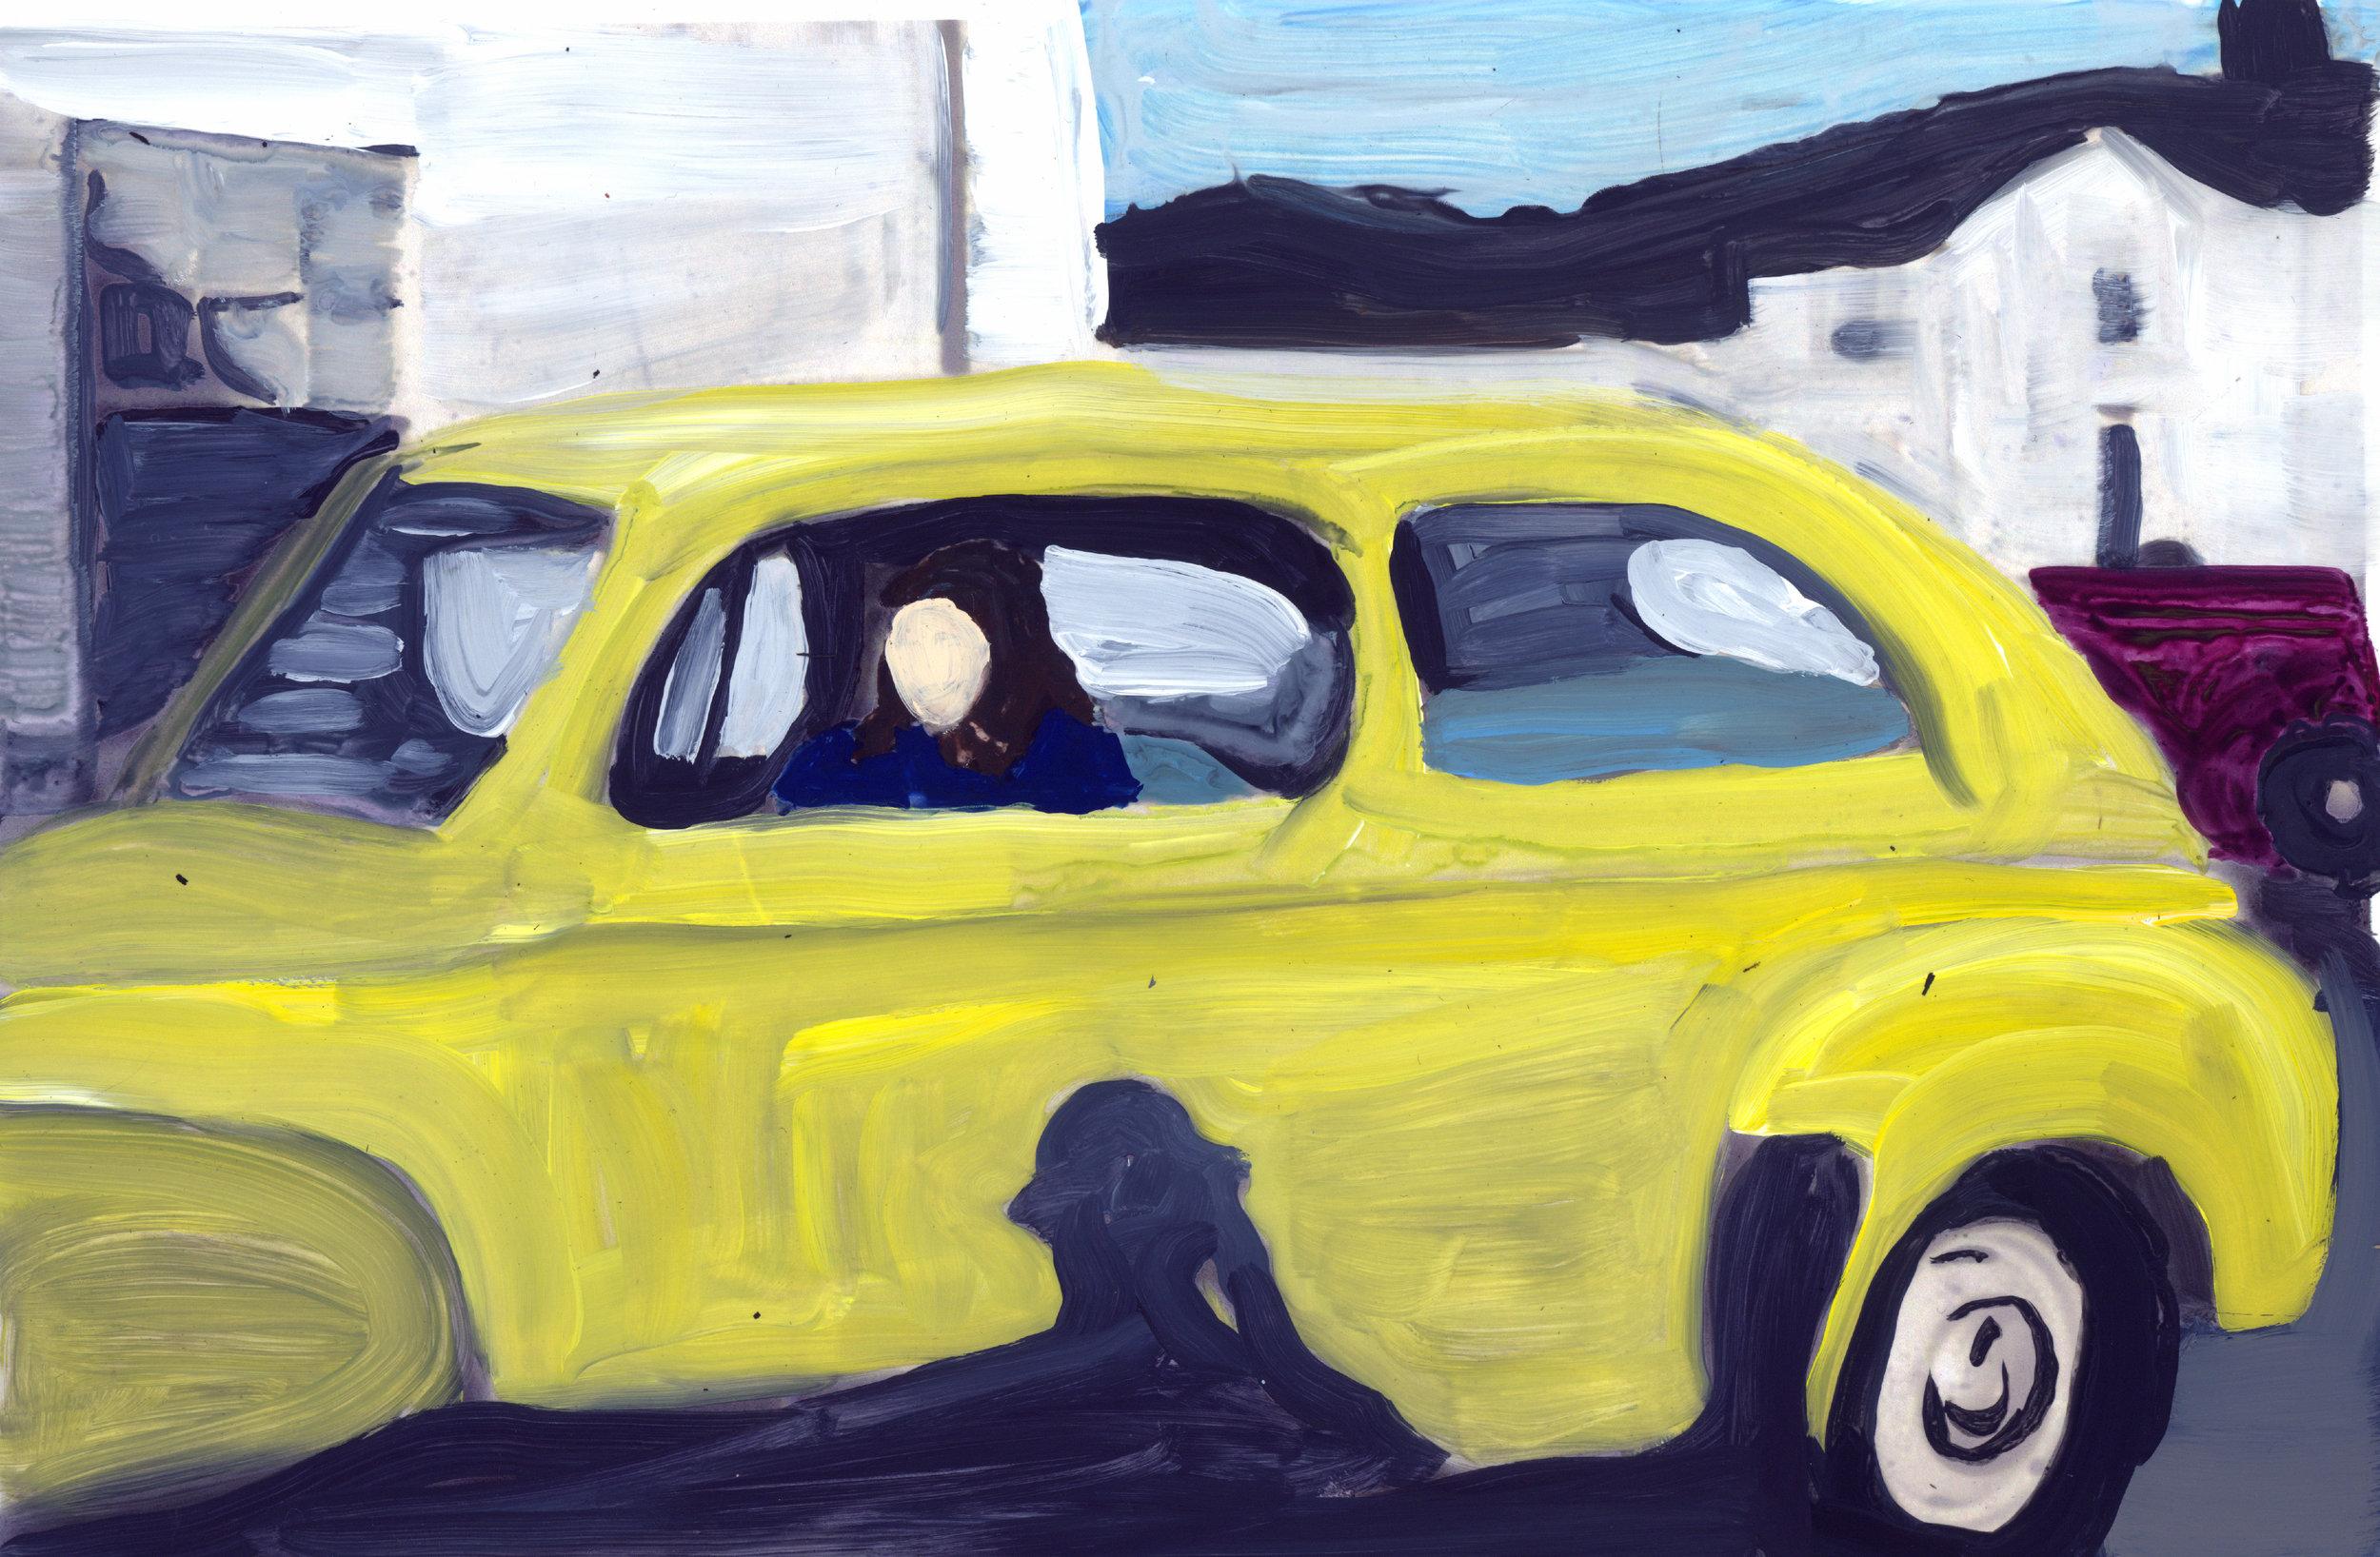 taking the wheel, making a getaway